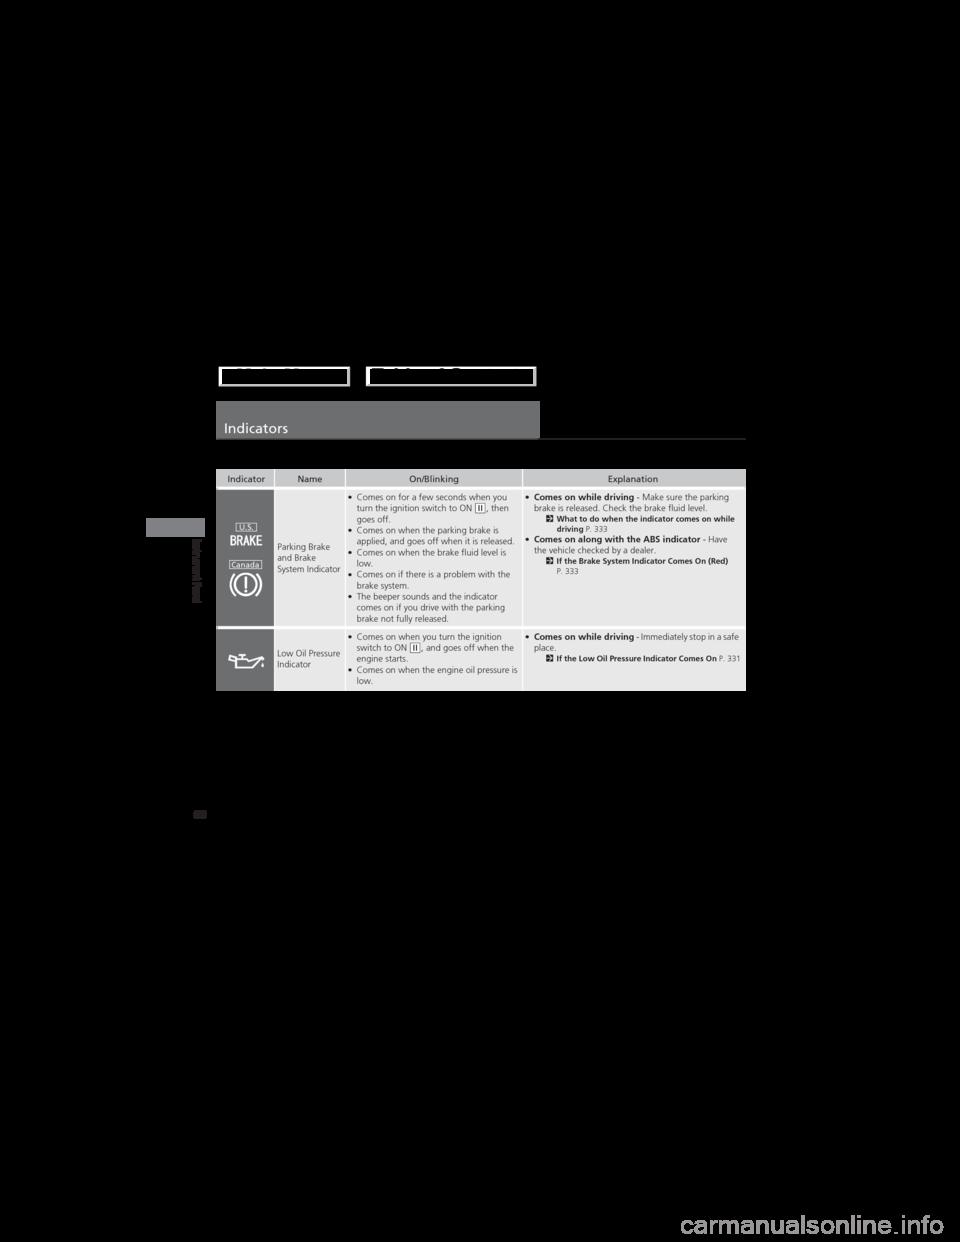 honda crv 2013 owners manual